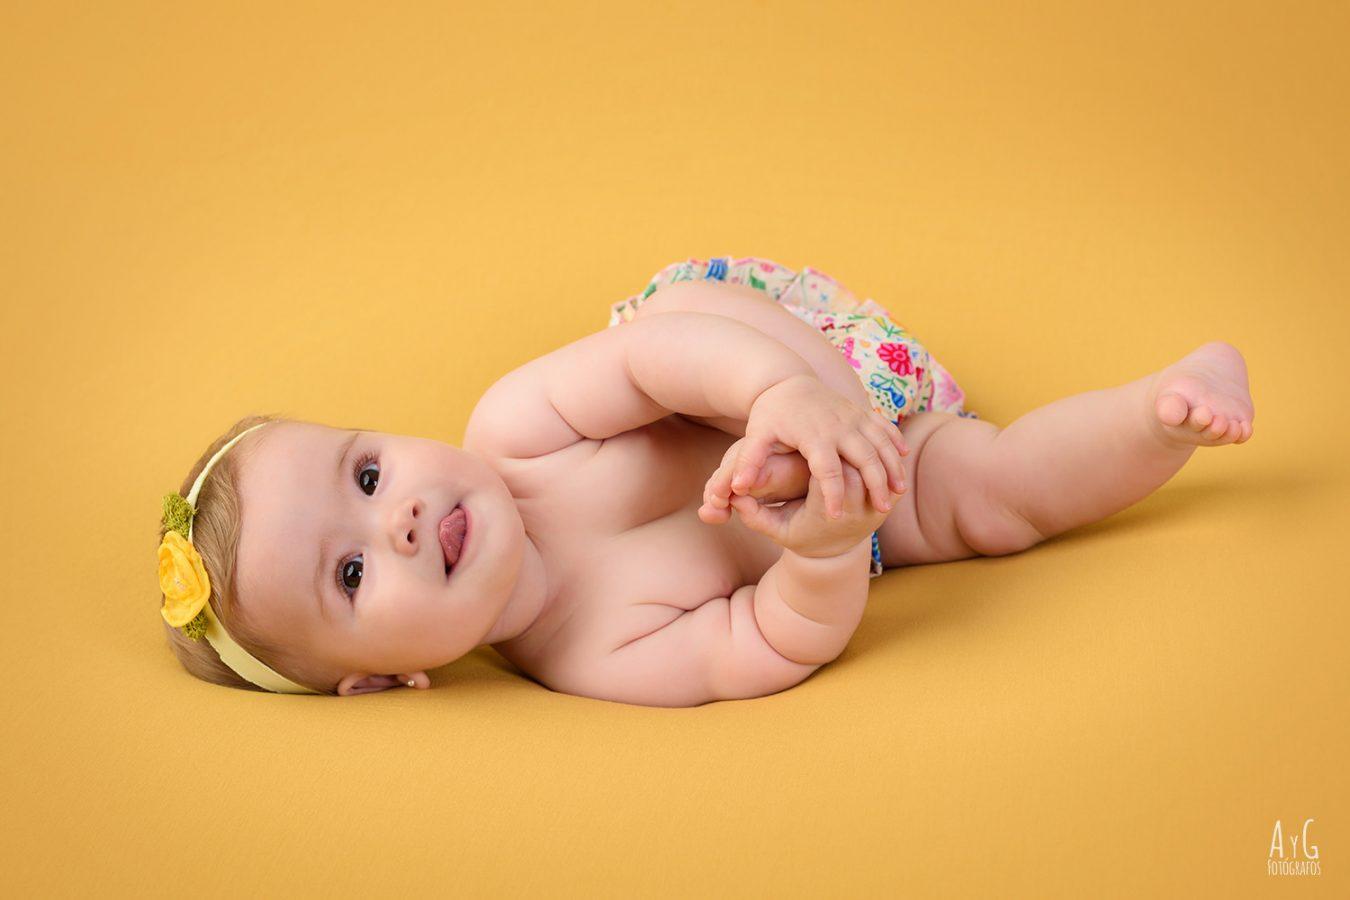 sesión infantil, bebés. Fotografía profesional en estudio en La Carlota, Córdoba.